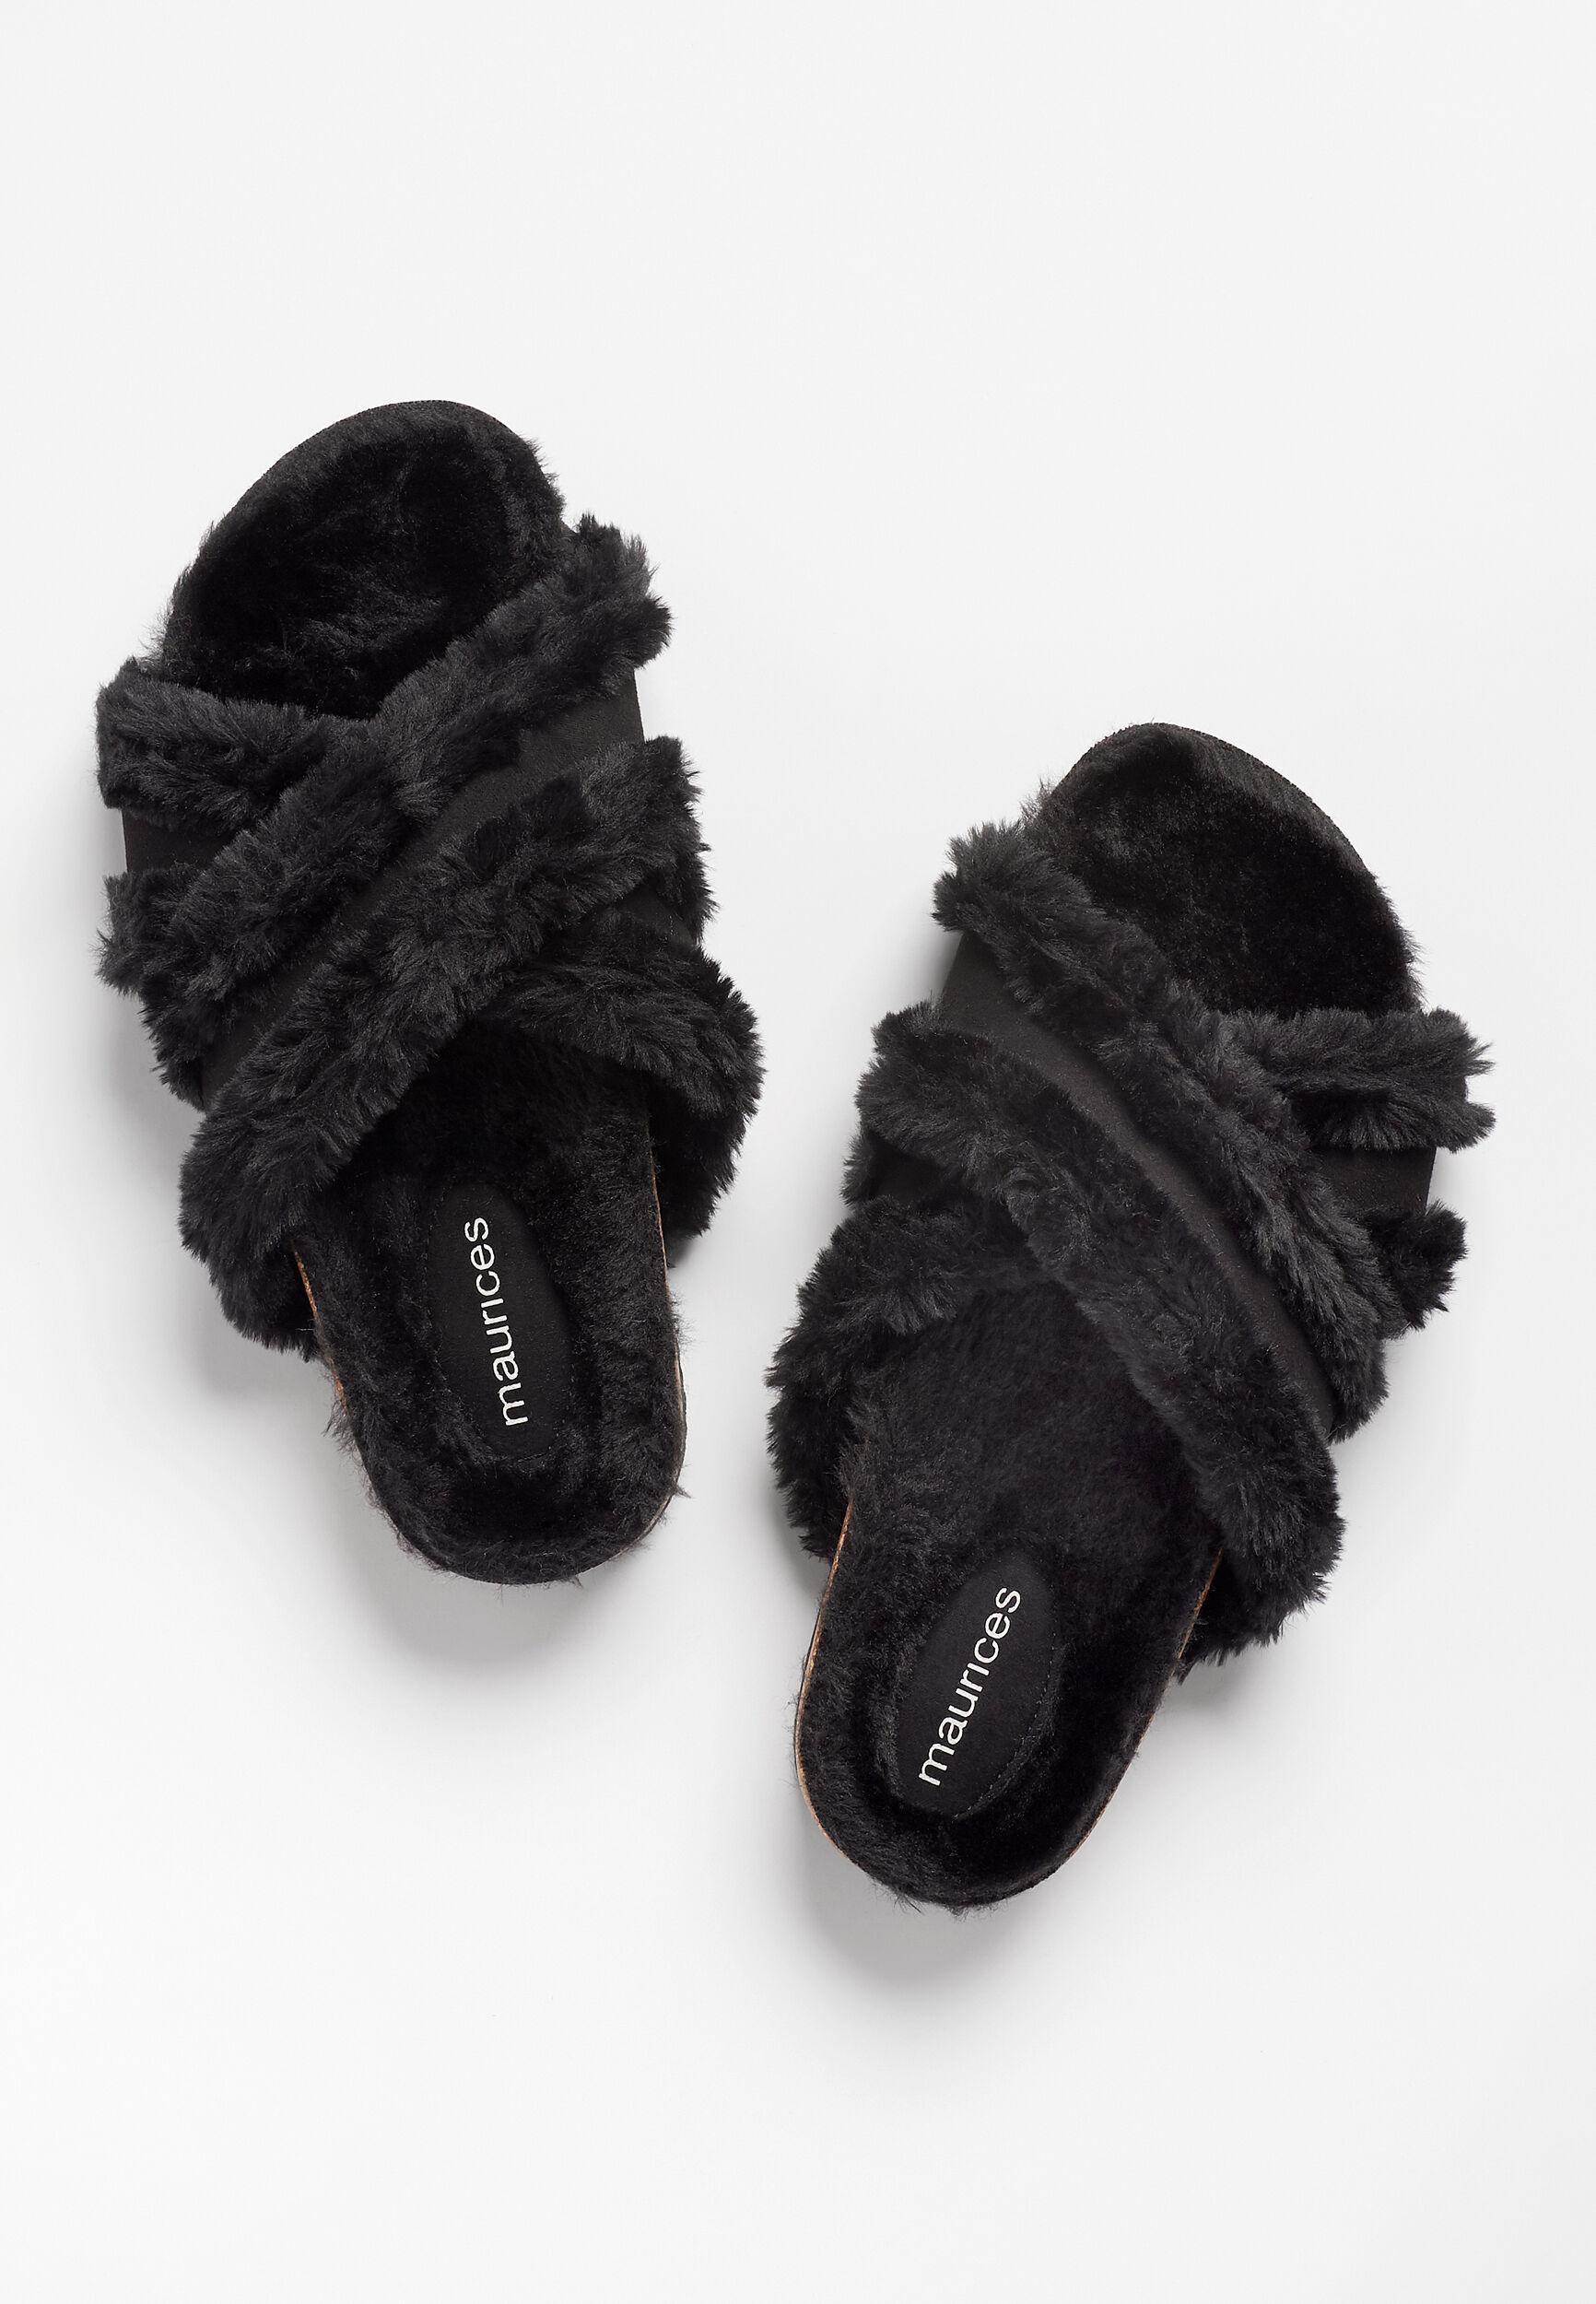 Maurices Womens Opal Black Criss Cross Faux Fur Lined Slipper  -  8